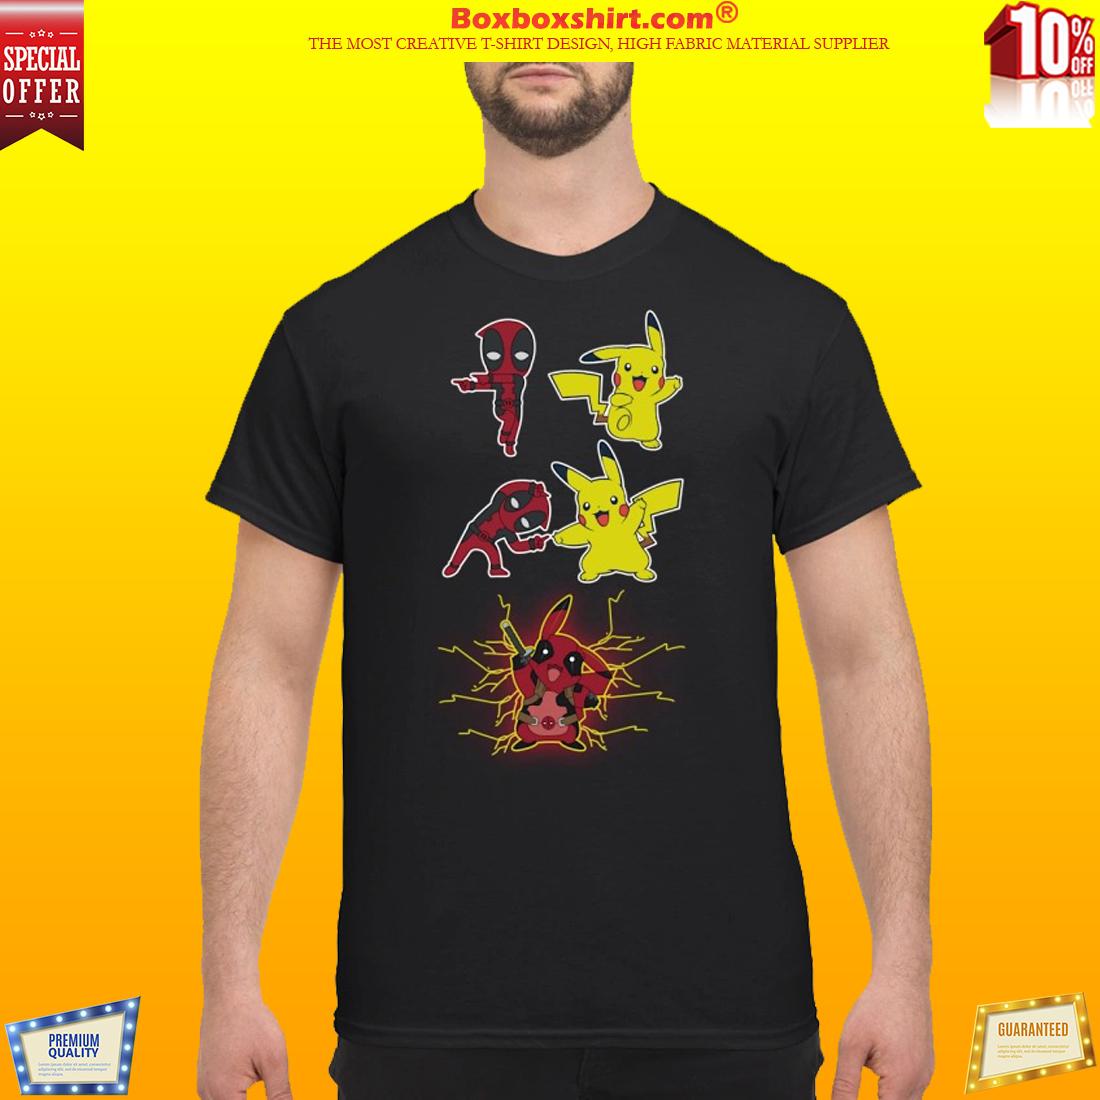 9b65a4e6 Pikachu fusion deadpool pikapool shirt